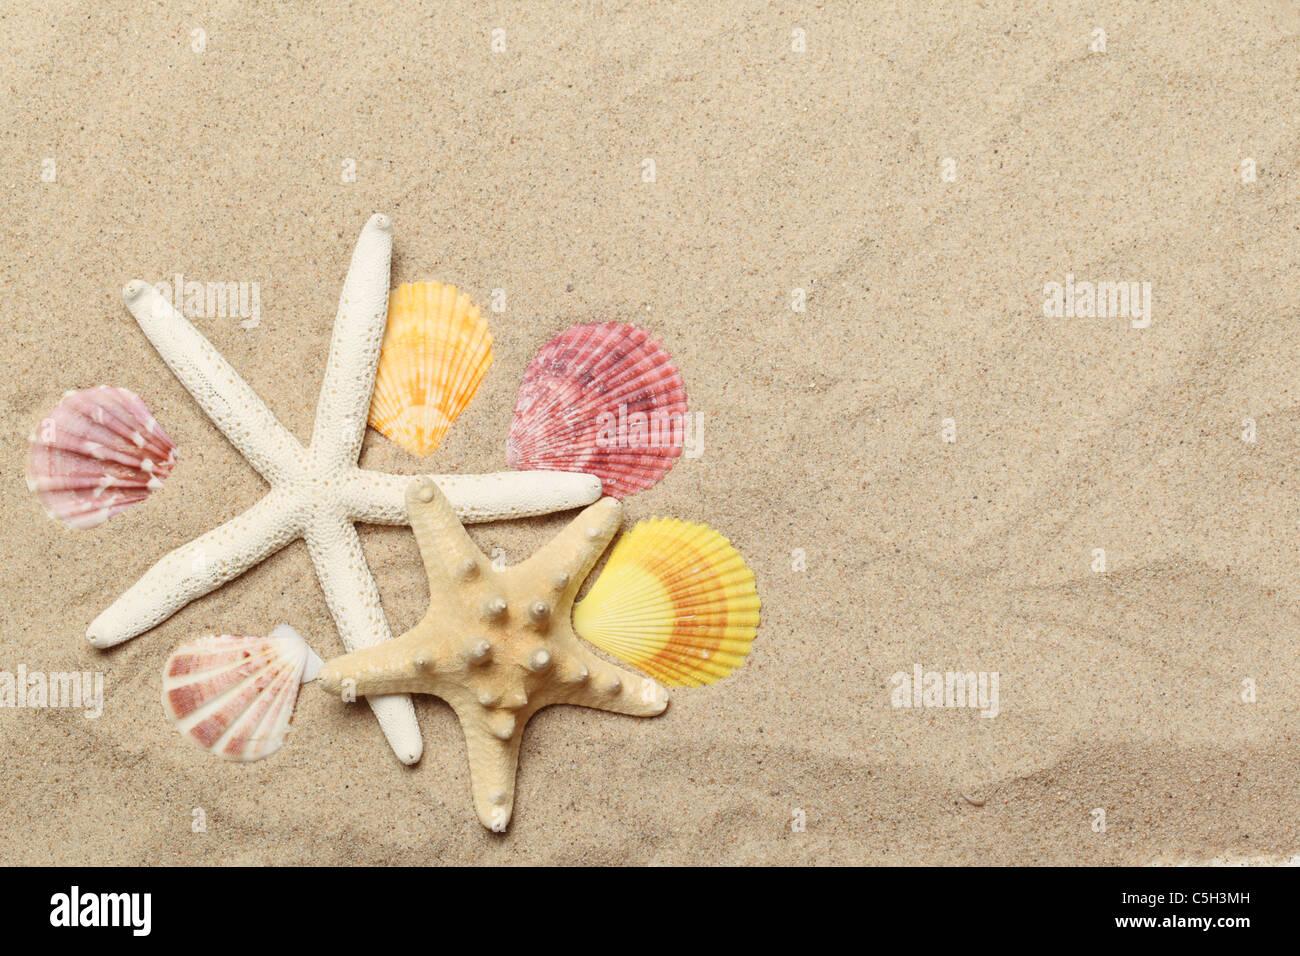 Seashells collection on sand background - Stock Image